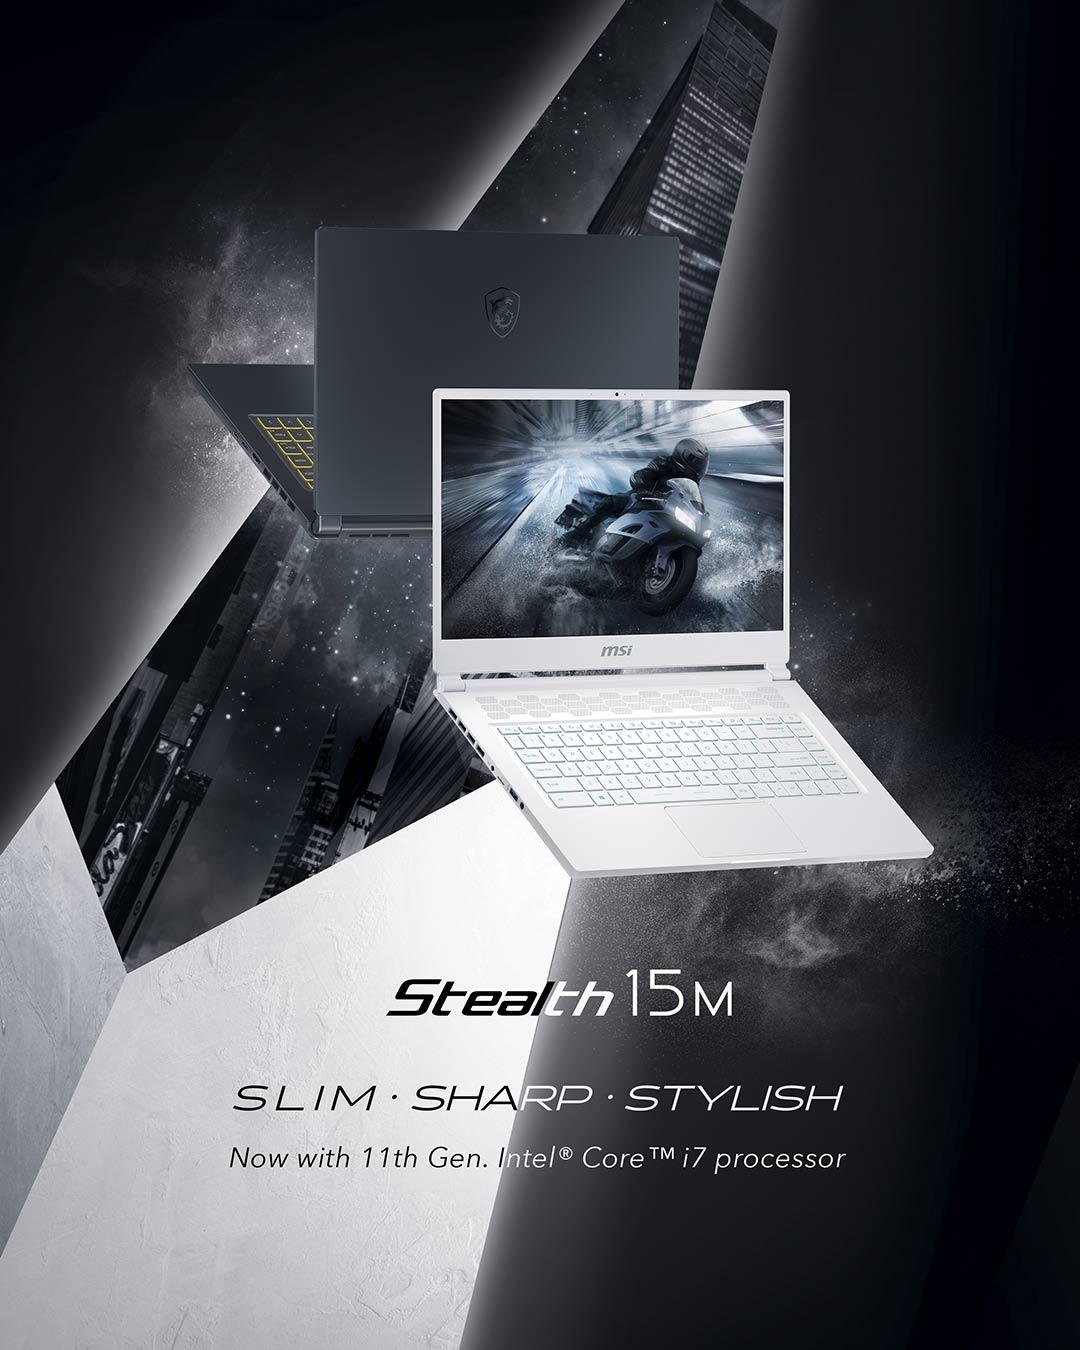 STEALTH 15M SLIM.SHARP.STYLISH